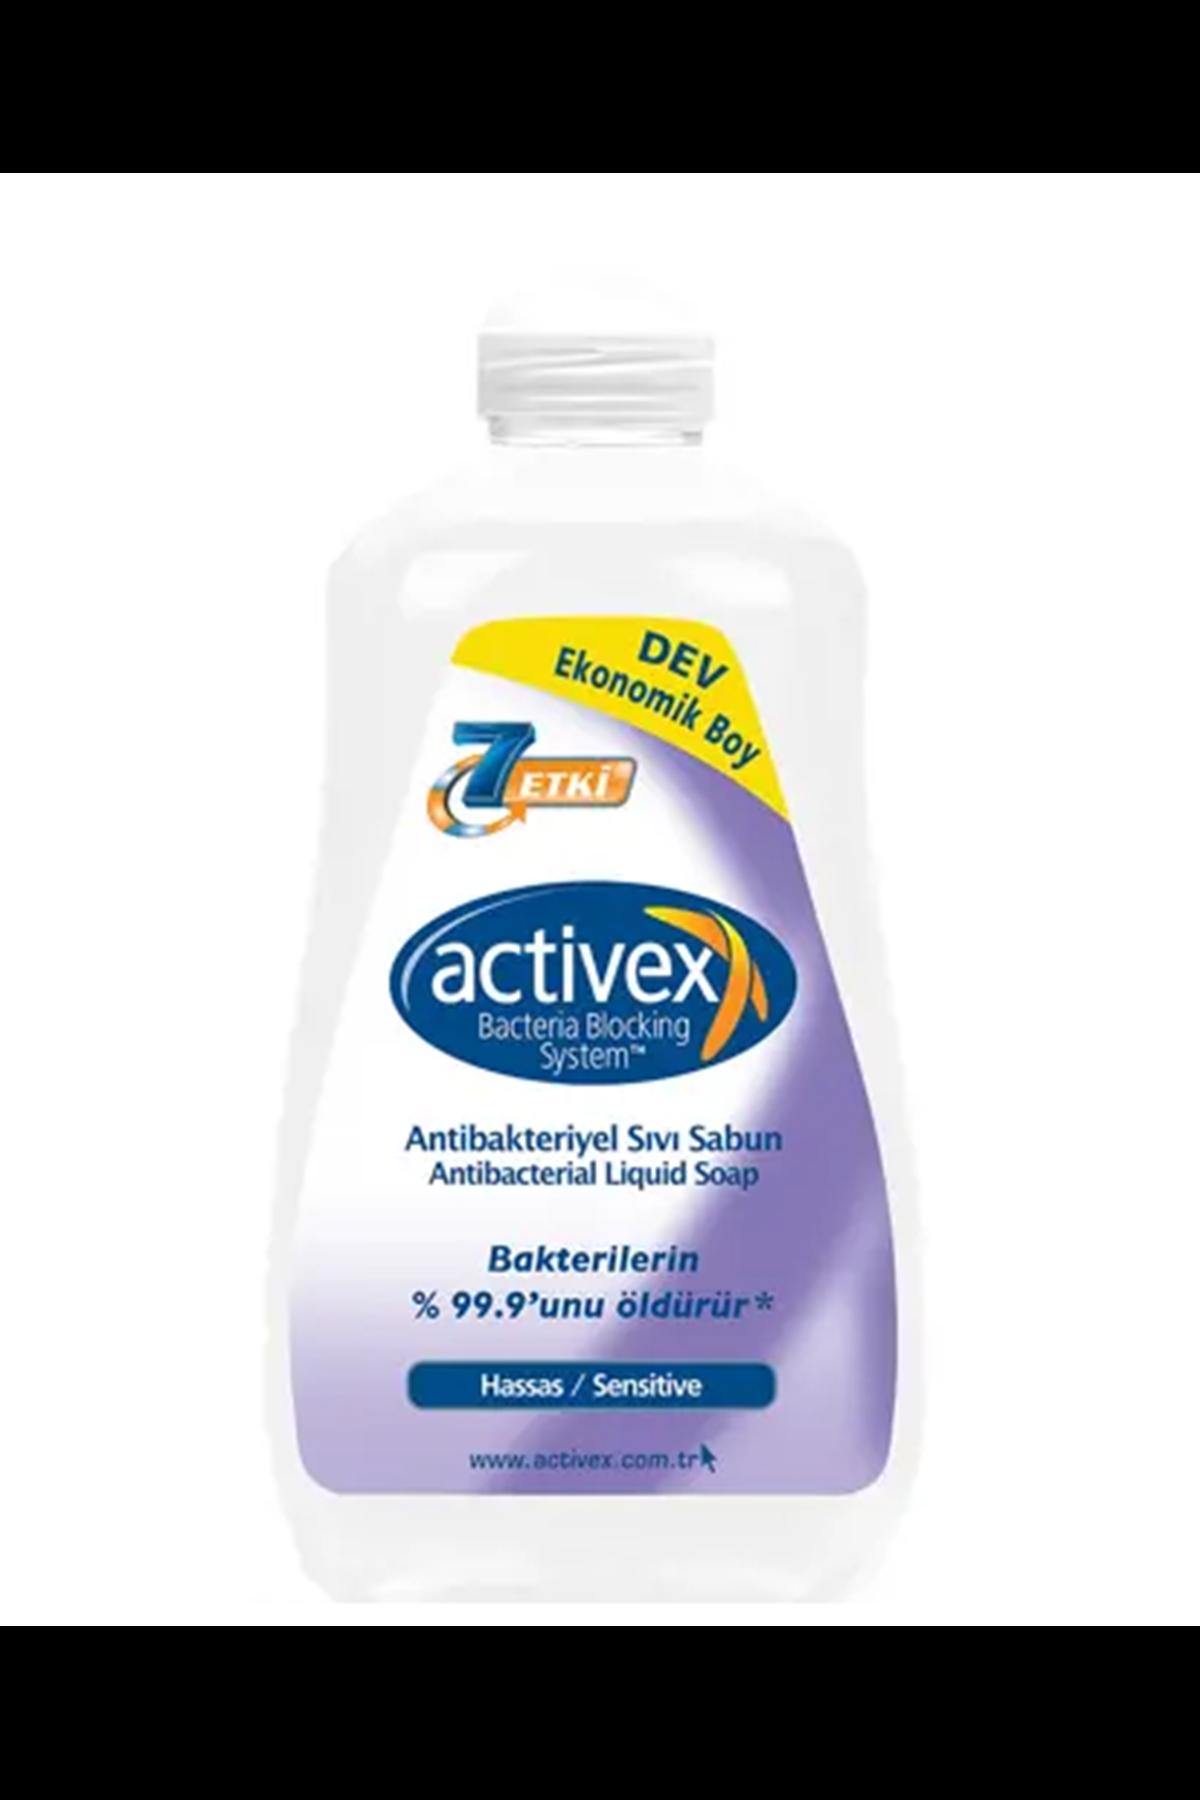 Activex Antibakteriyel Sıvı Sabun 1,8 Litre Hassas